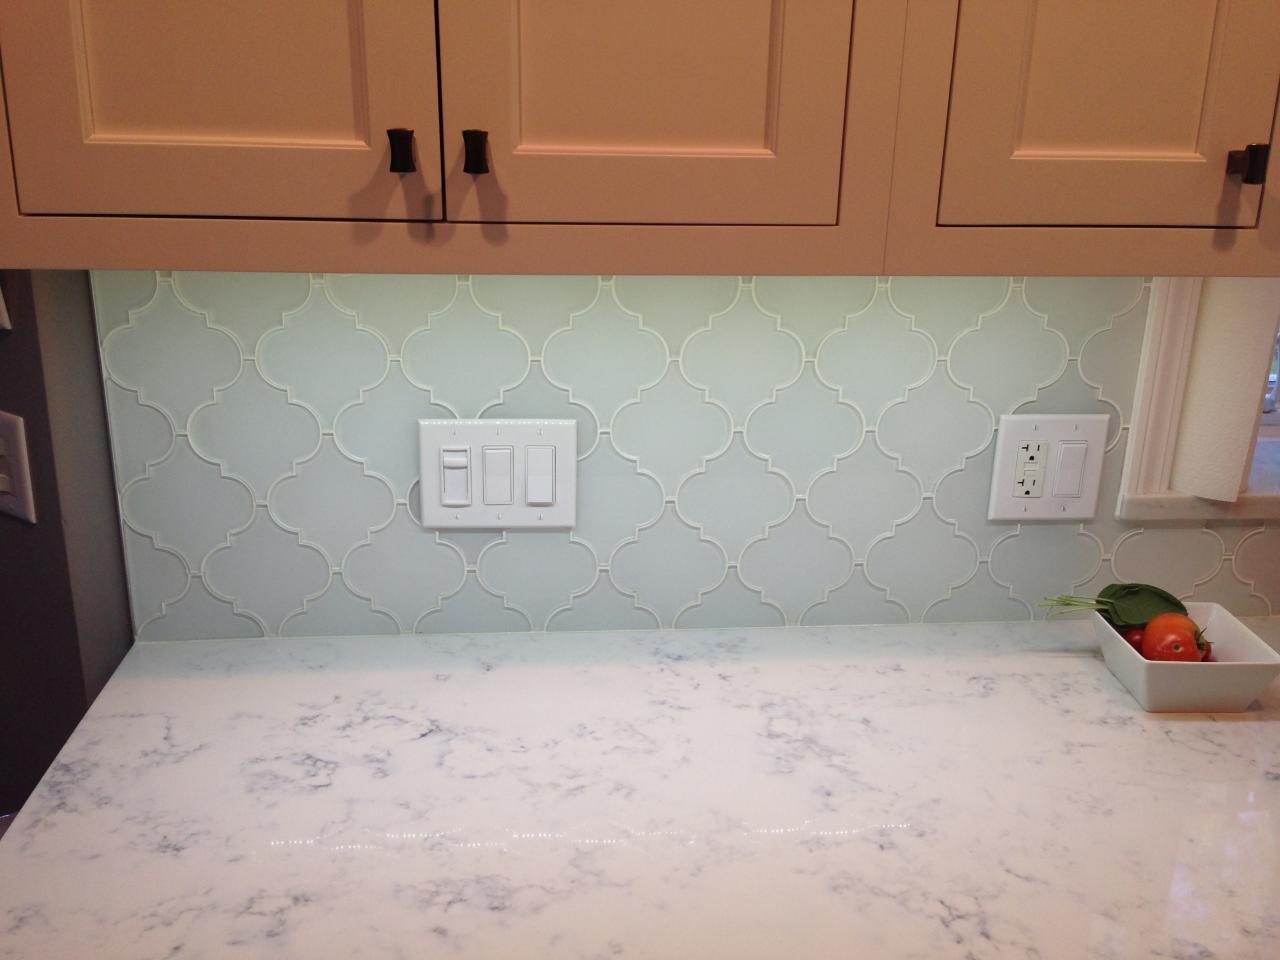 Glass Tile Backsplash Pictures Bathroom: Snow White Arabesque Glass Mosaic Tiles